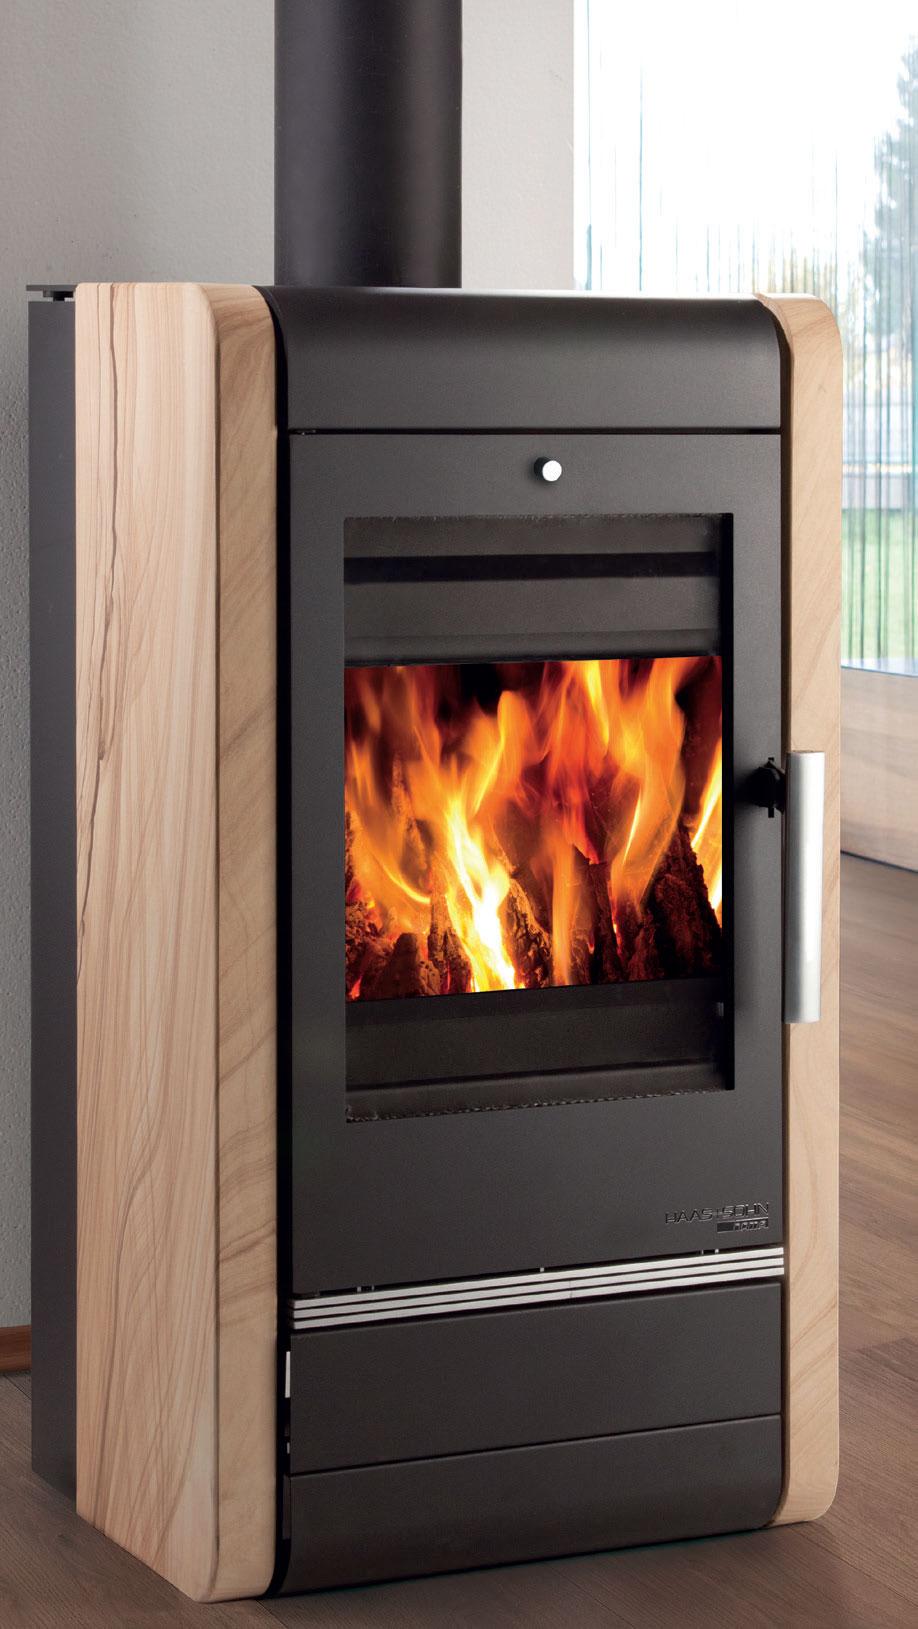 kaminofen haas sohn aqua trento easy wasserf hr stein wood 8kw bei. Black Bedroom Furniture Sets. Home Design Ideas